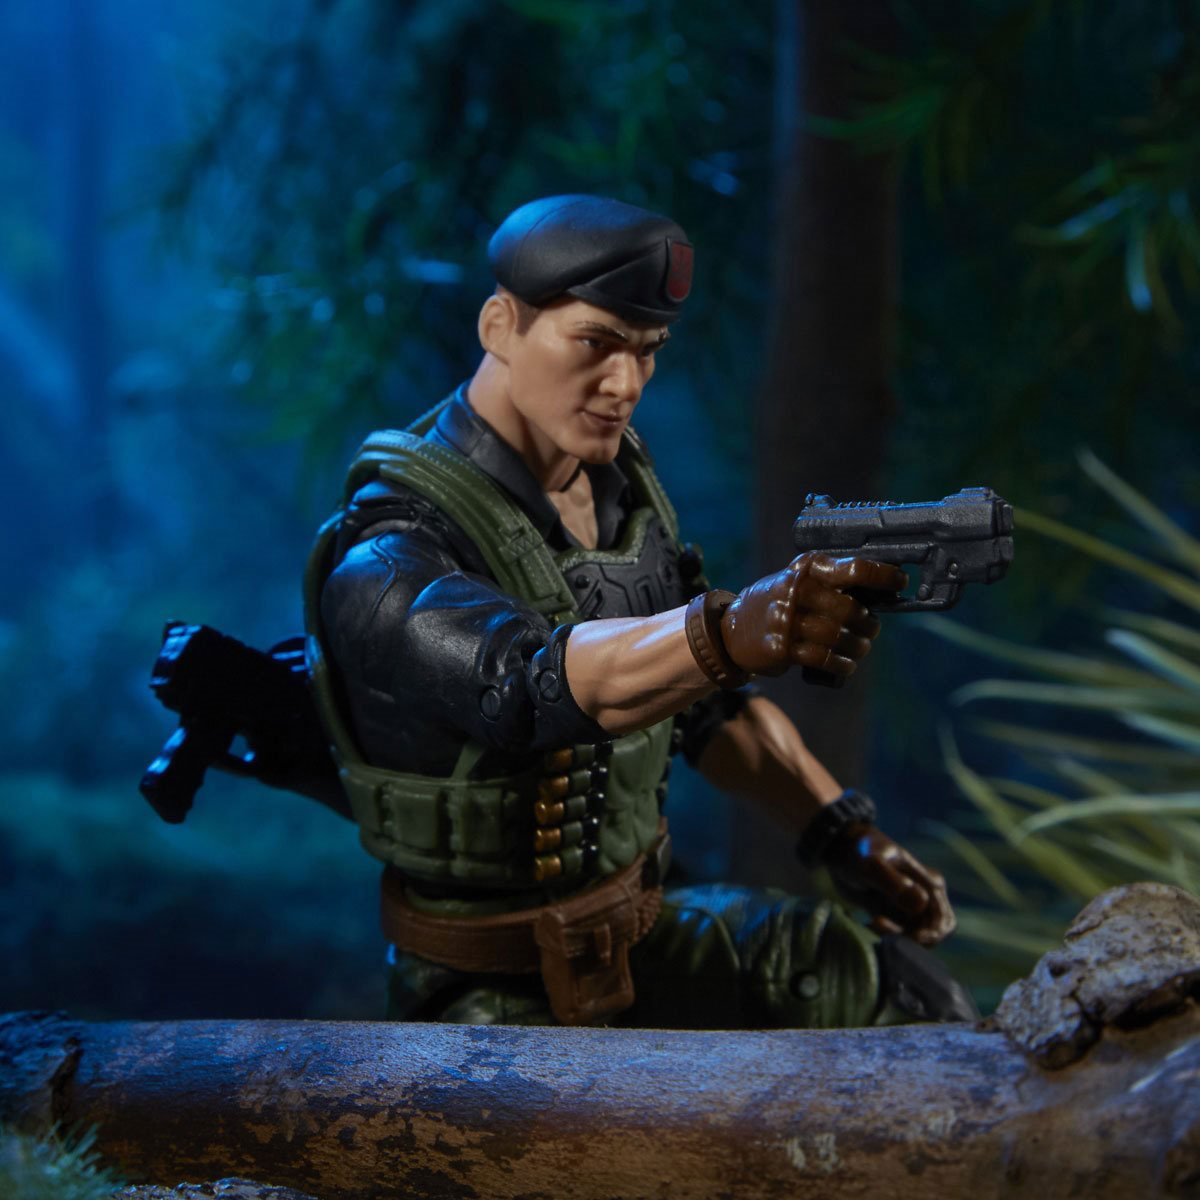 flint-gi-joe-classified-series-action-figure-pre-order-4